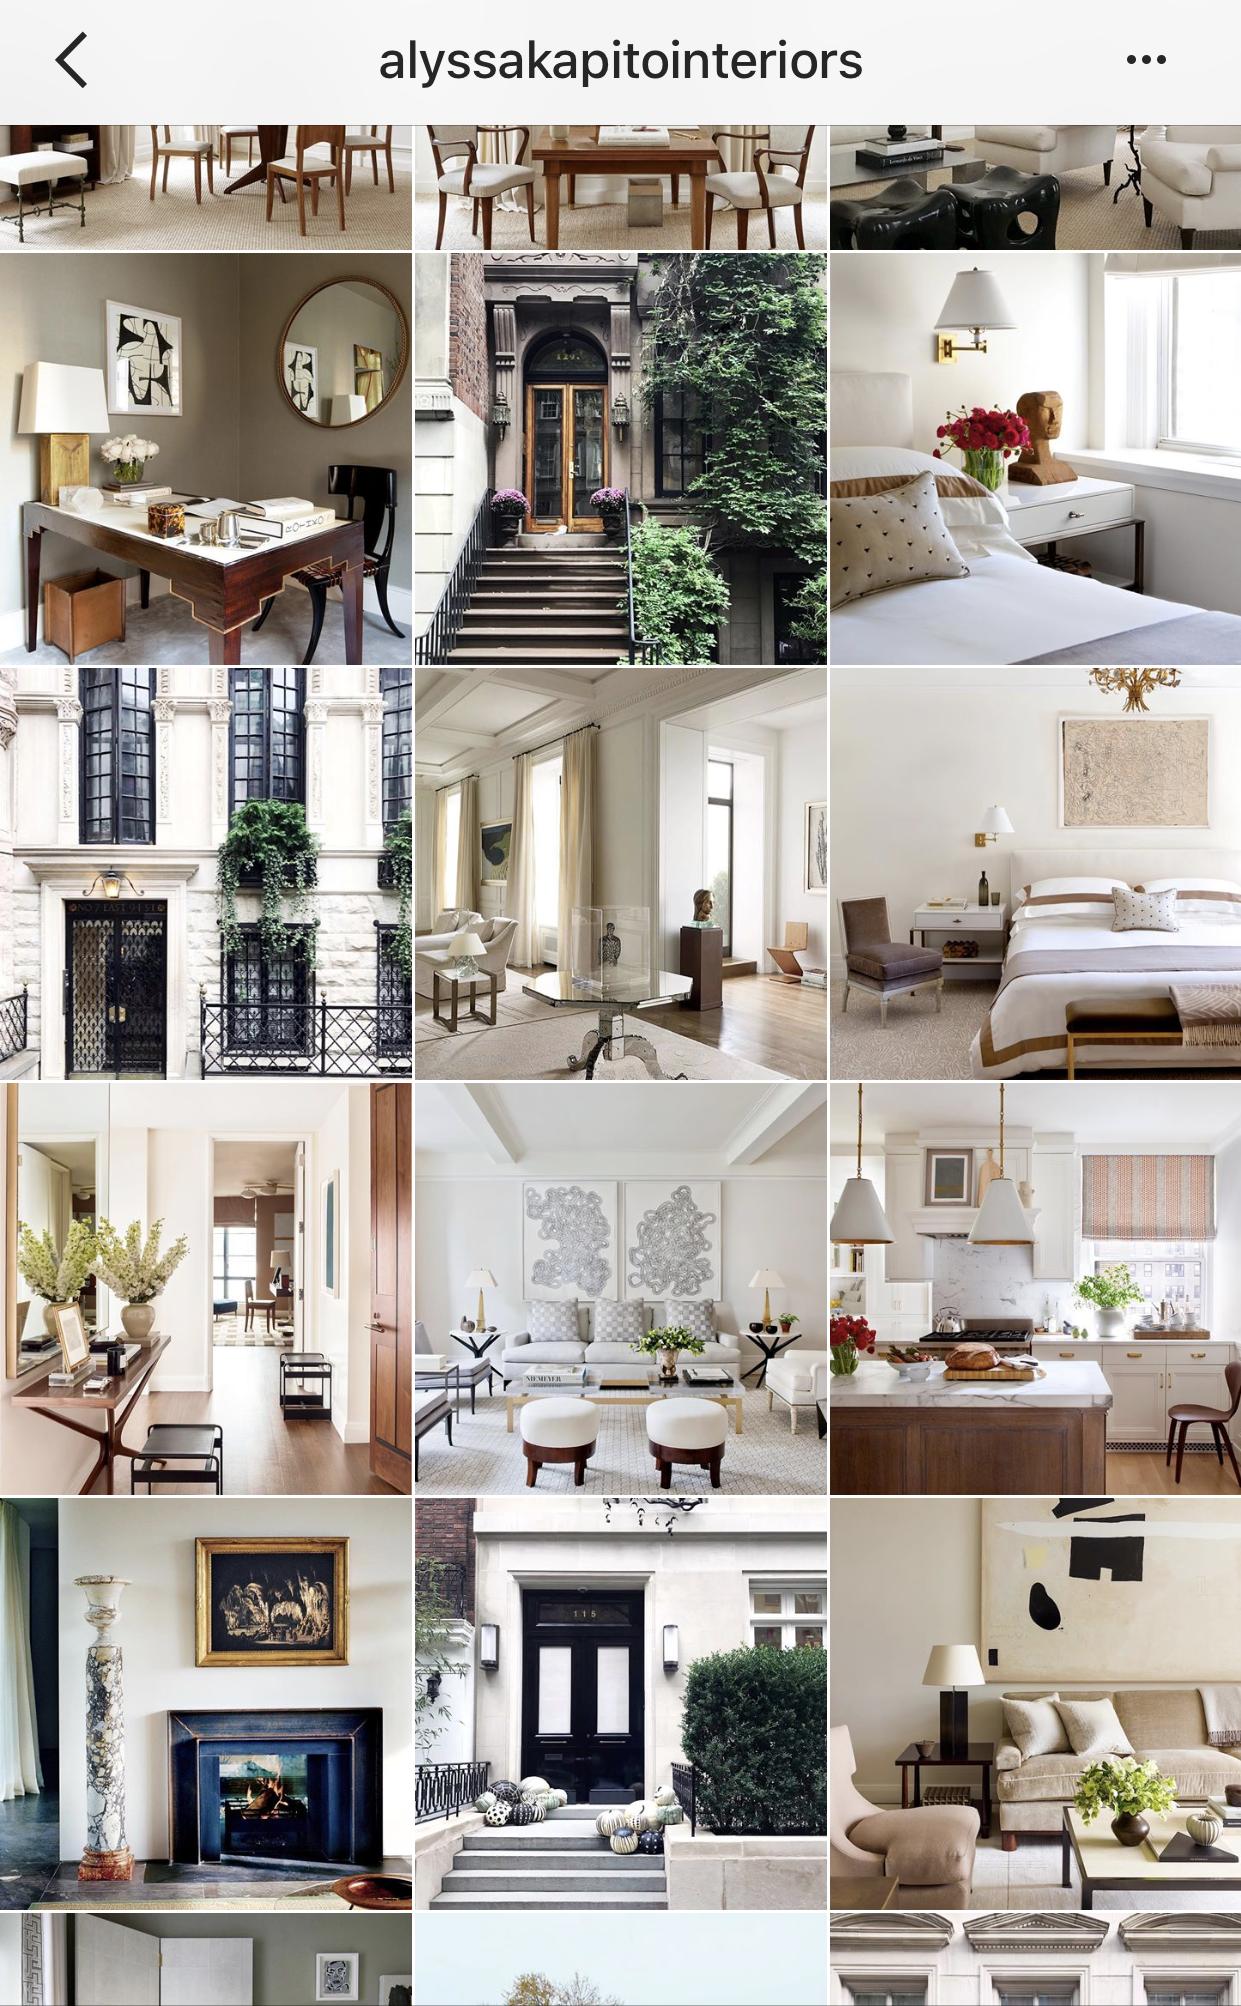 Design: My 10 Favourite Design Accounts